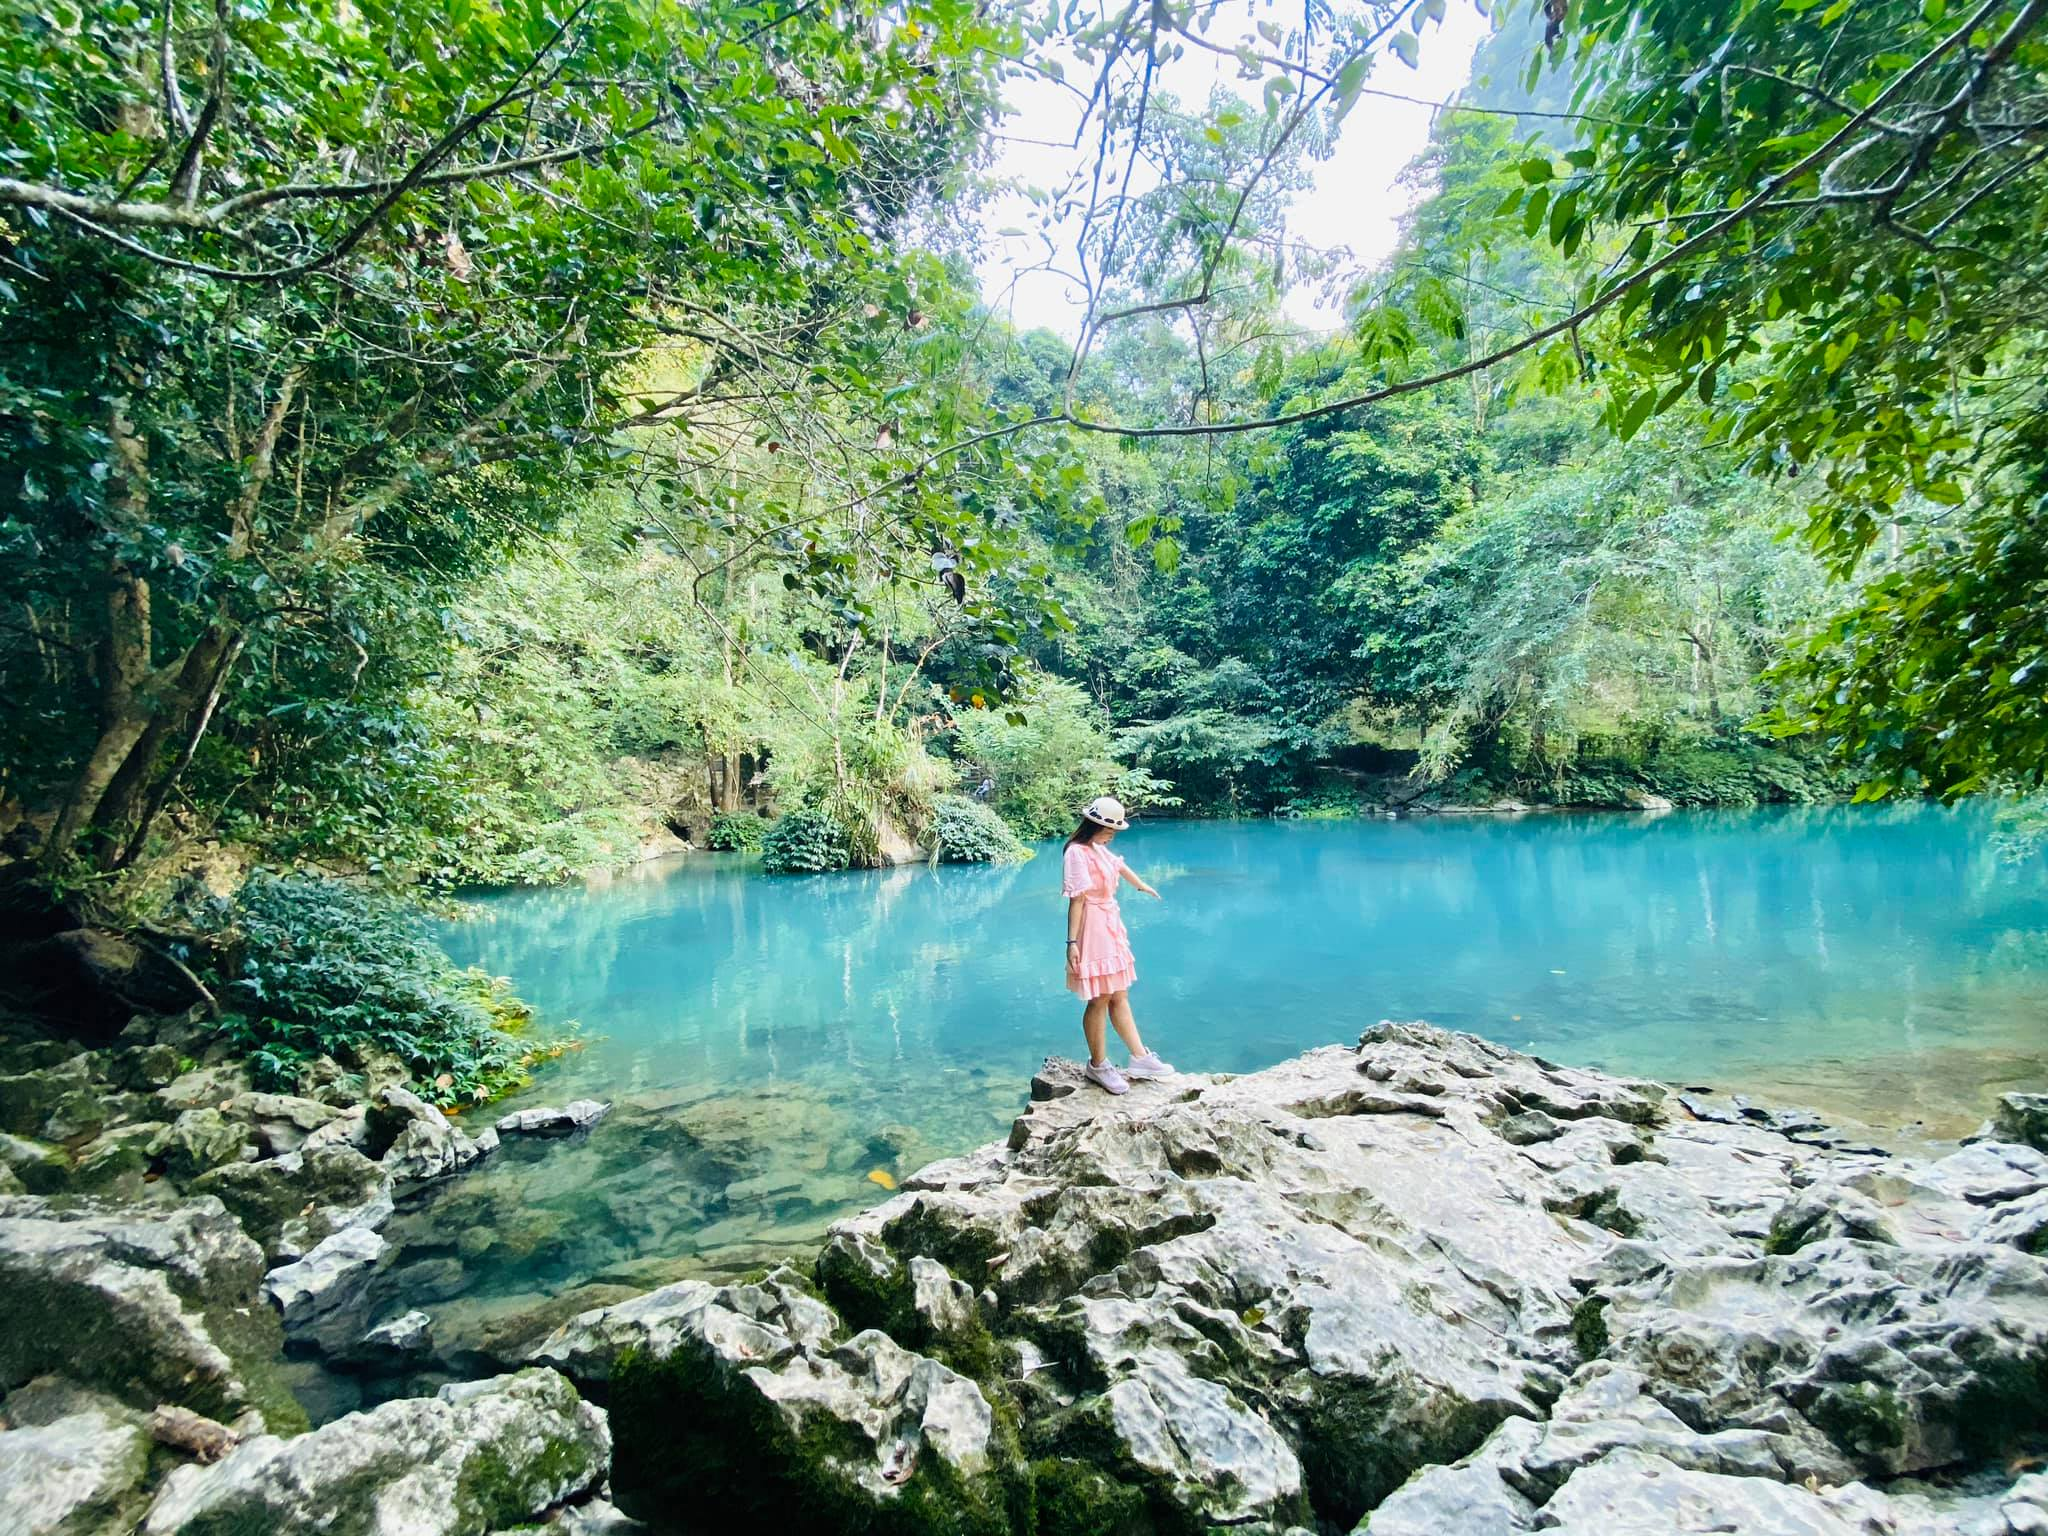 Suoi-le-nin-nang-tho-cua-manh-dat-cao-bang-vietmountain-travel7